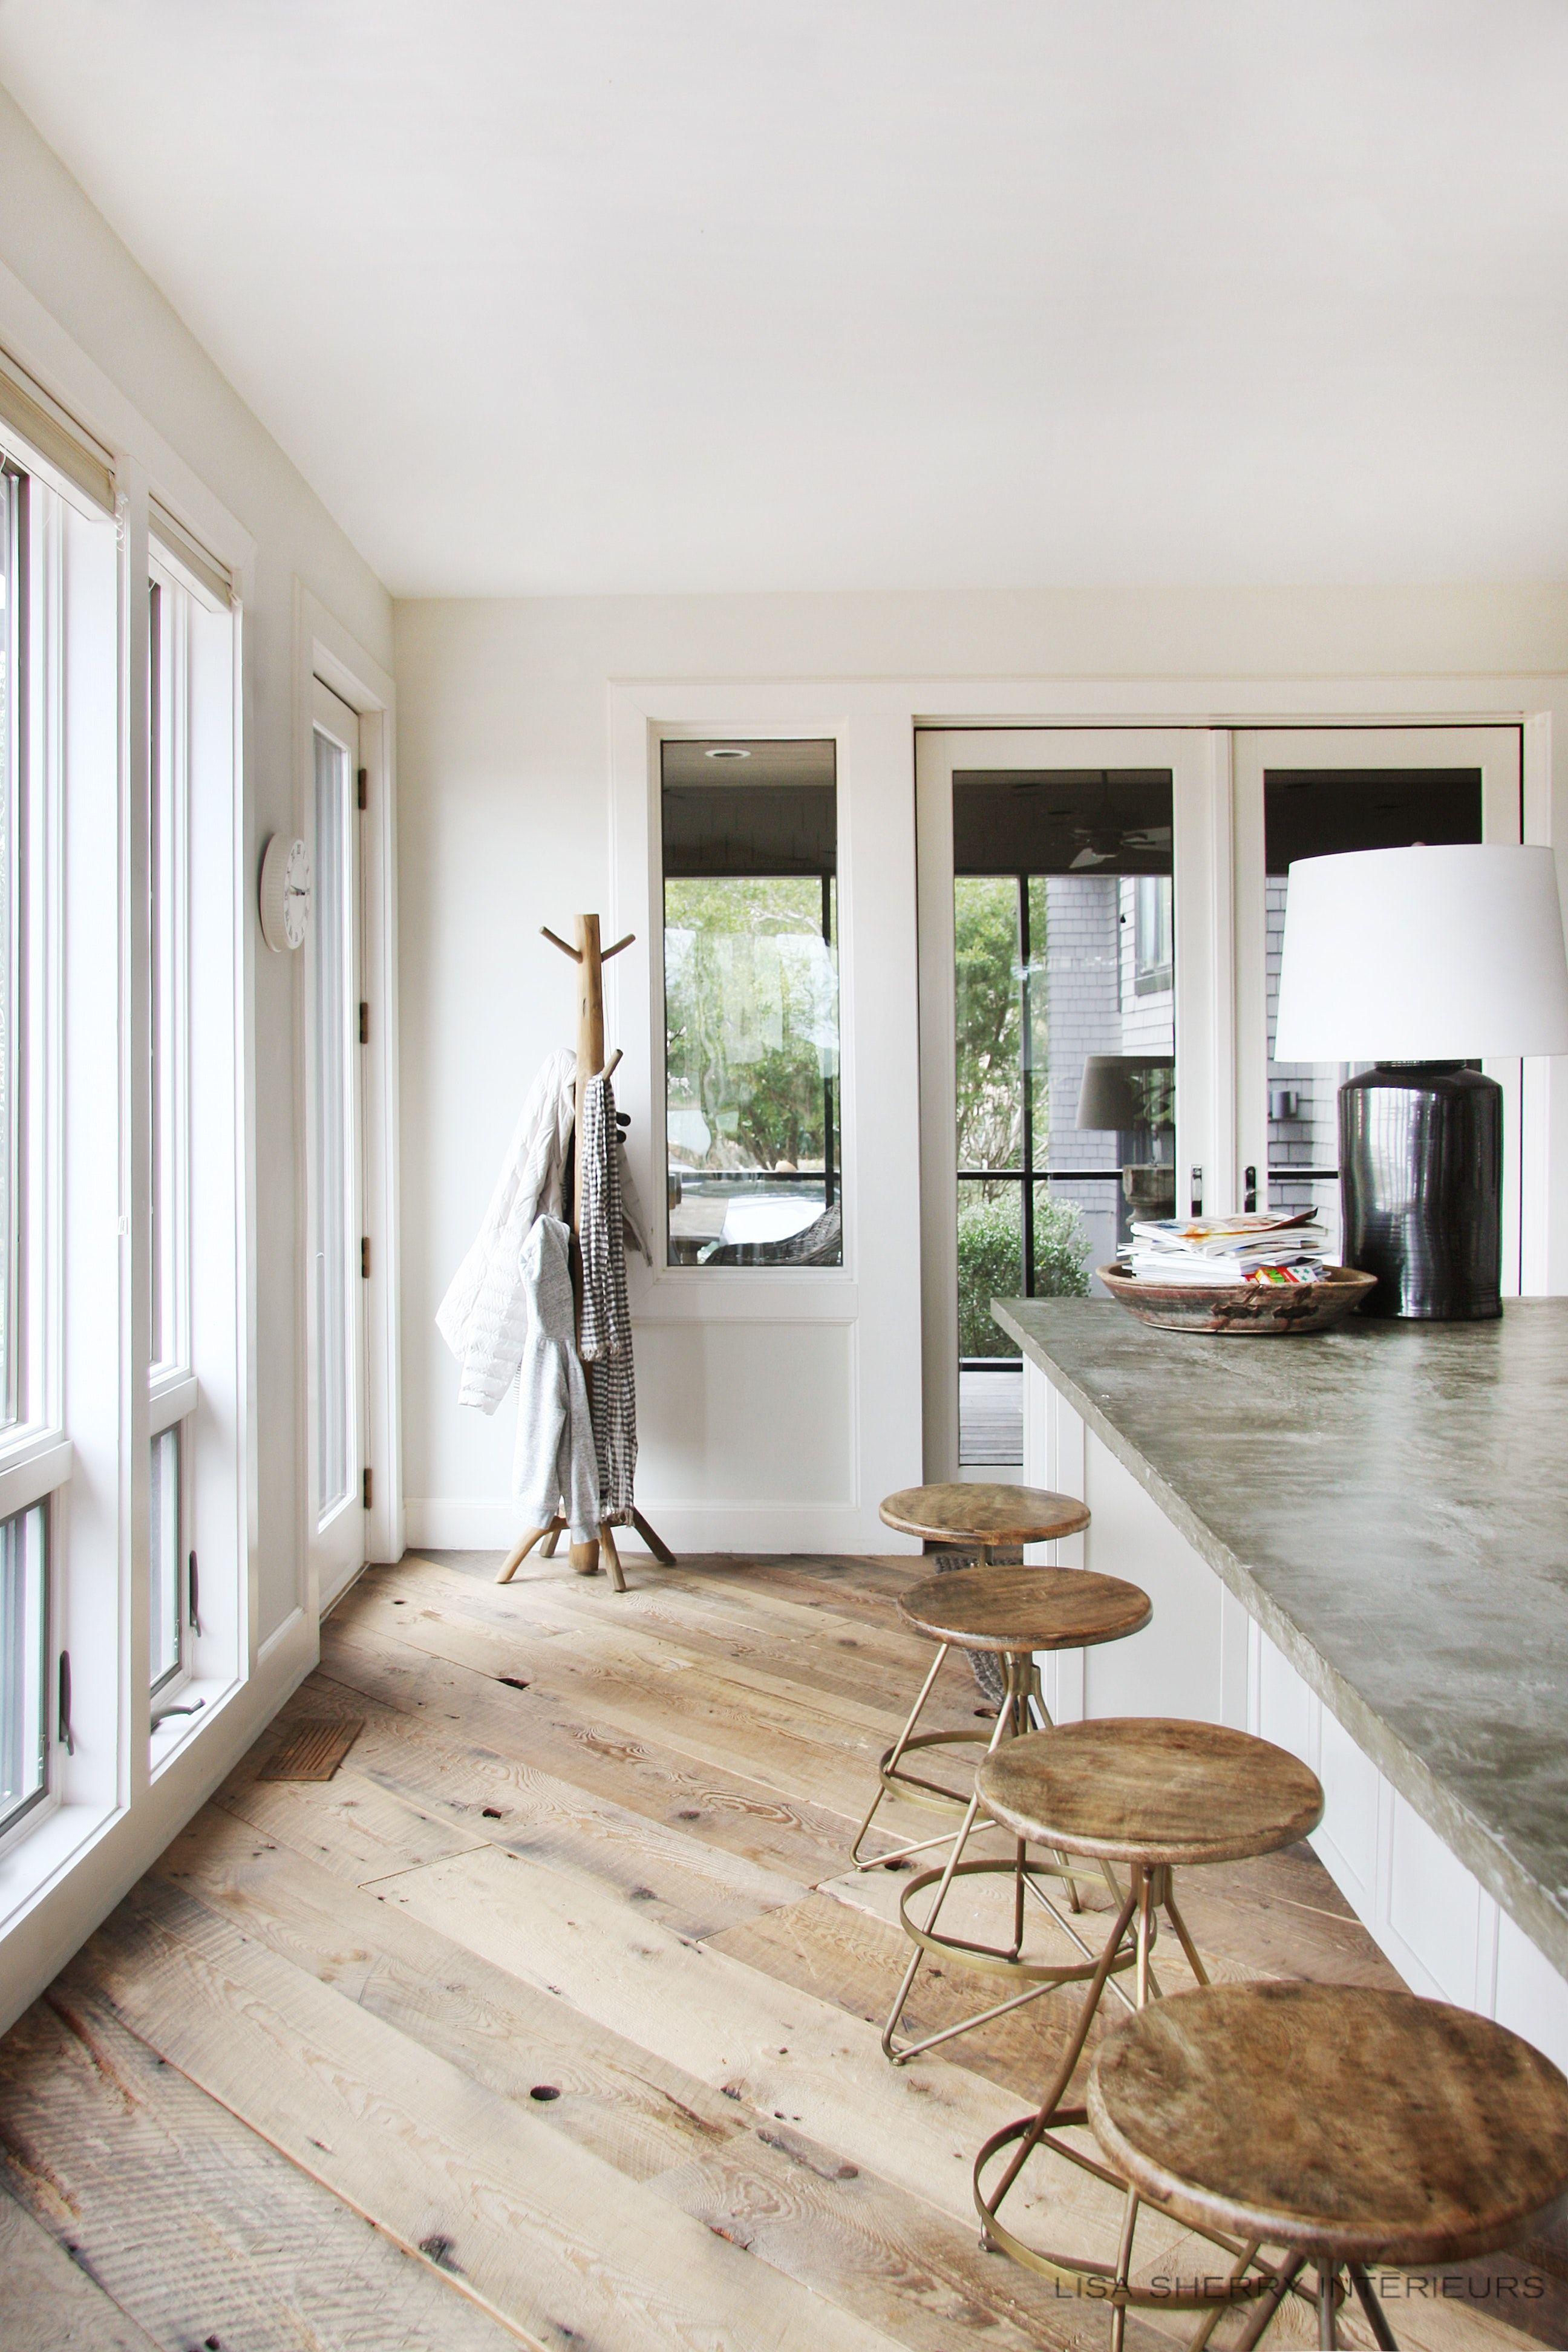 Modern kitchen by lisa sherry interieurs lookbook dering hall